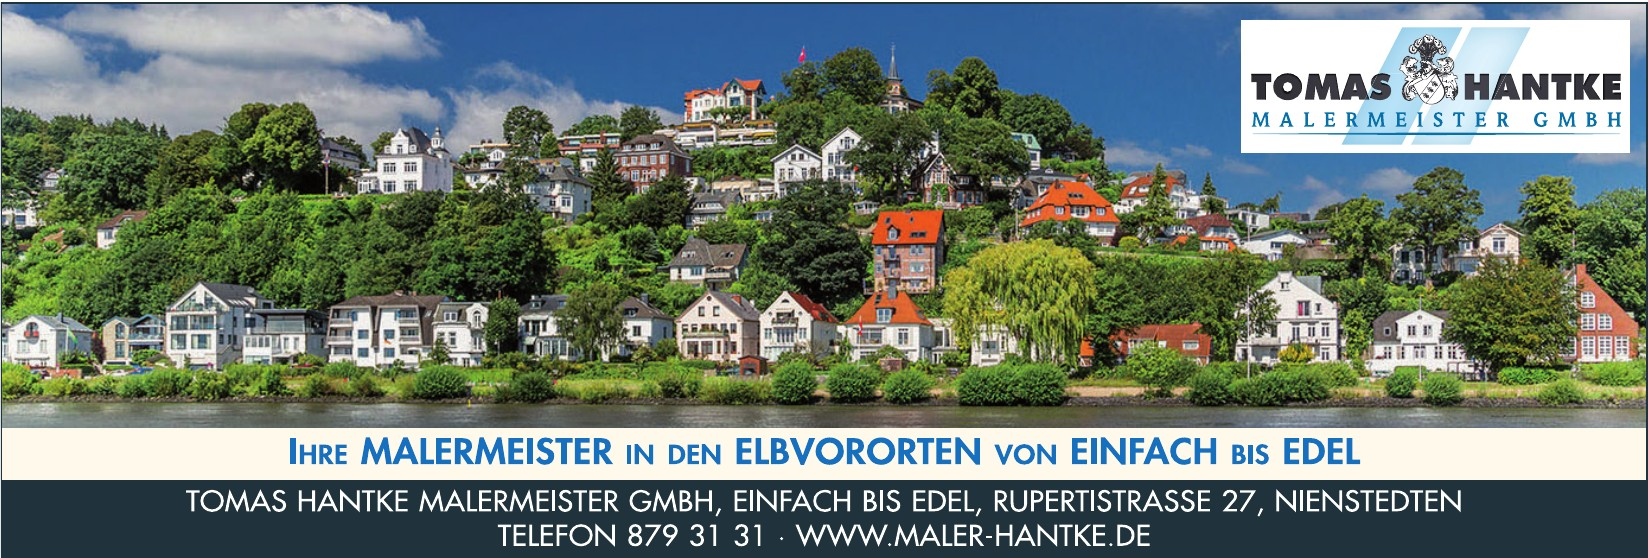 Tomas Hantke Malermeister GmbH